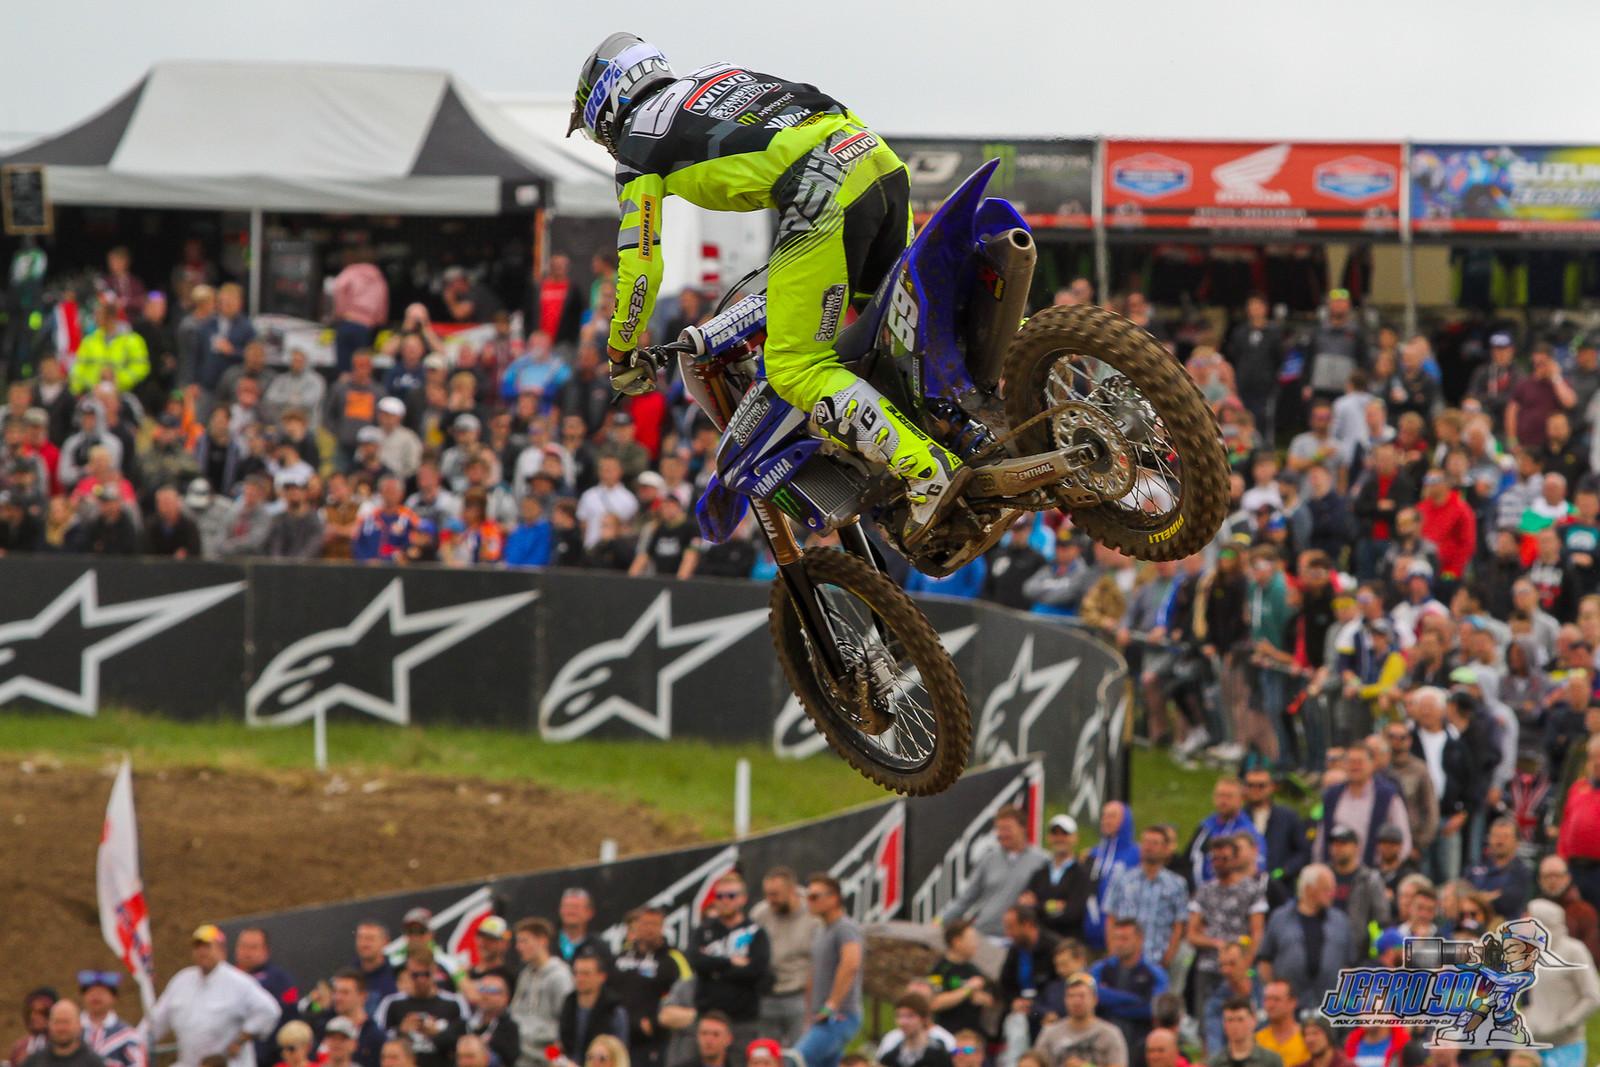 Aleksandr Tonkov - Photo Gallery: MXGP of Great Britain - Motocross Pictures - Vital MX